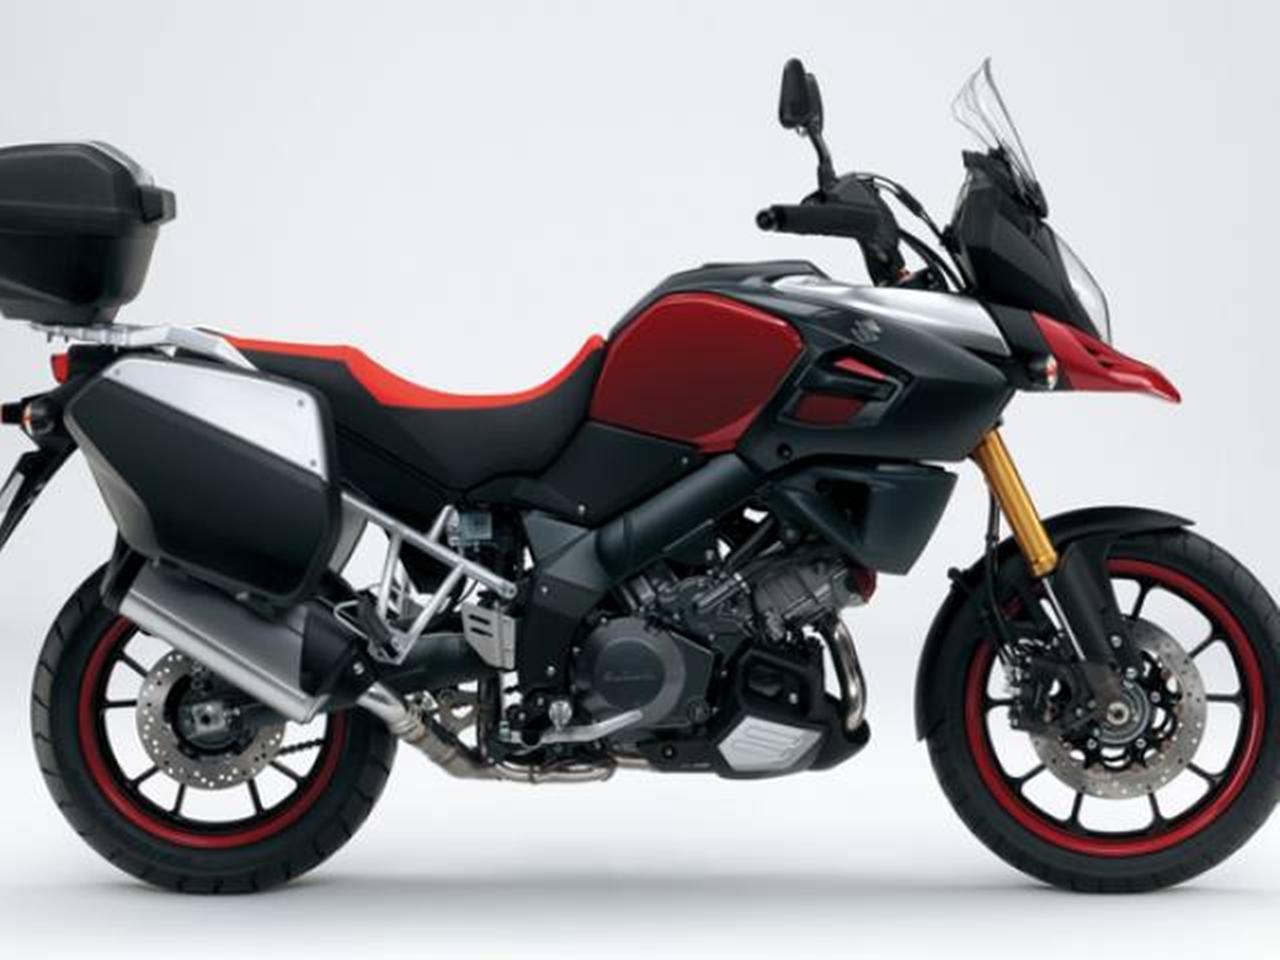 Suzuki V-Strom1000 concept